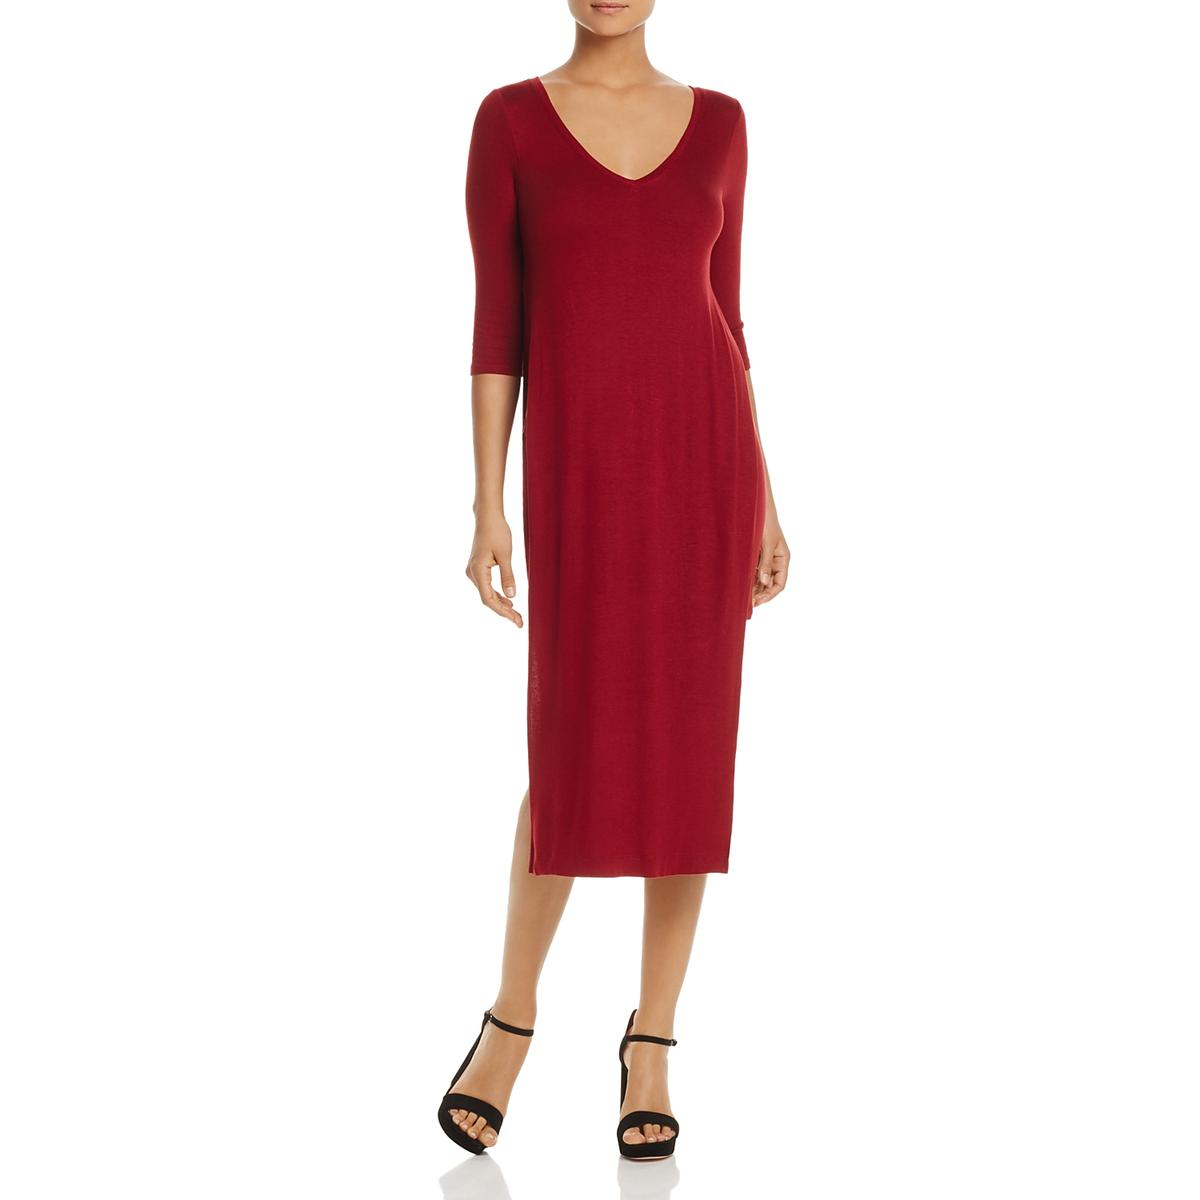 f5d234a4a951 Details about Three Dots Womens V Neck Sheath Midi T-Shirt Dress BHFO 3863